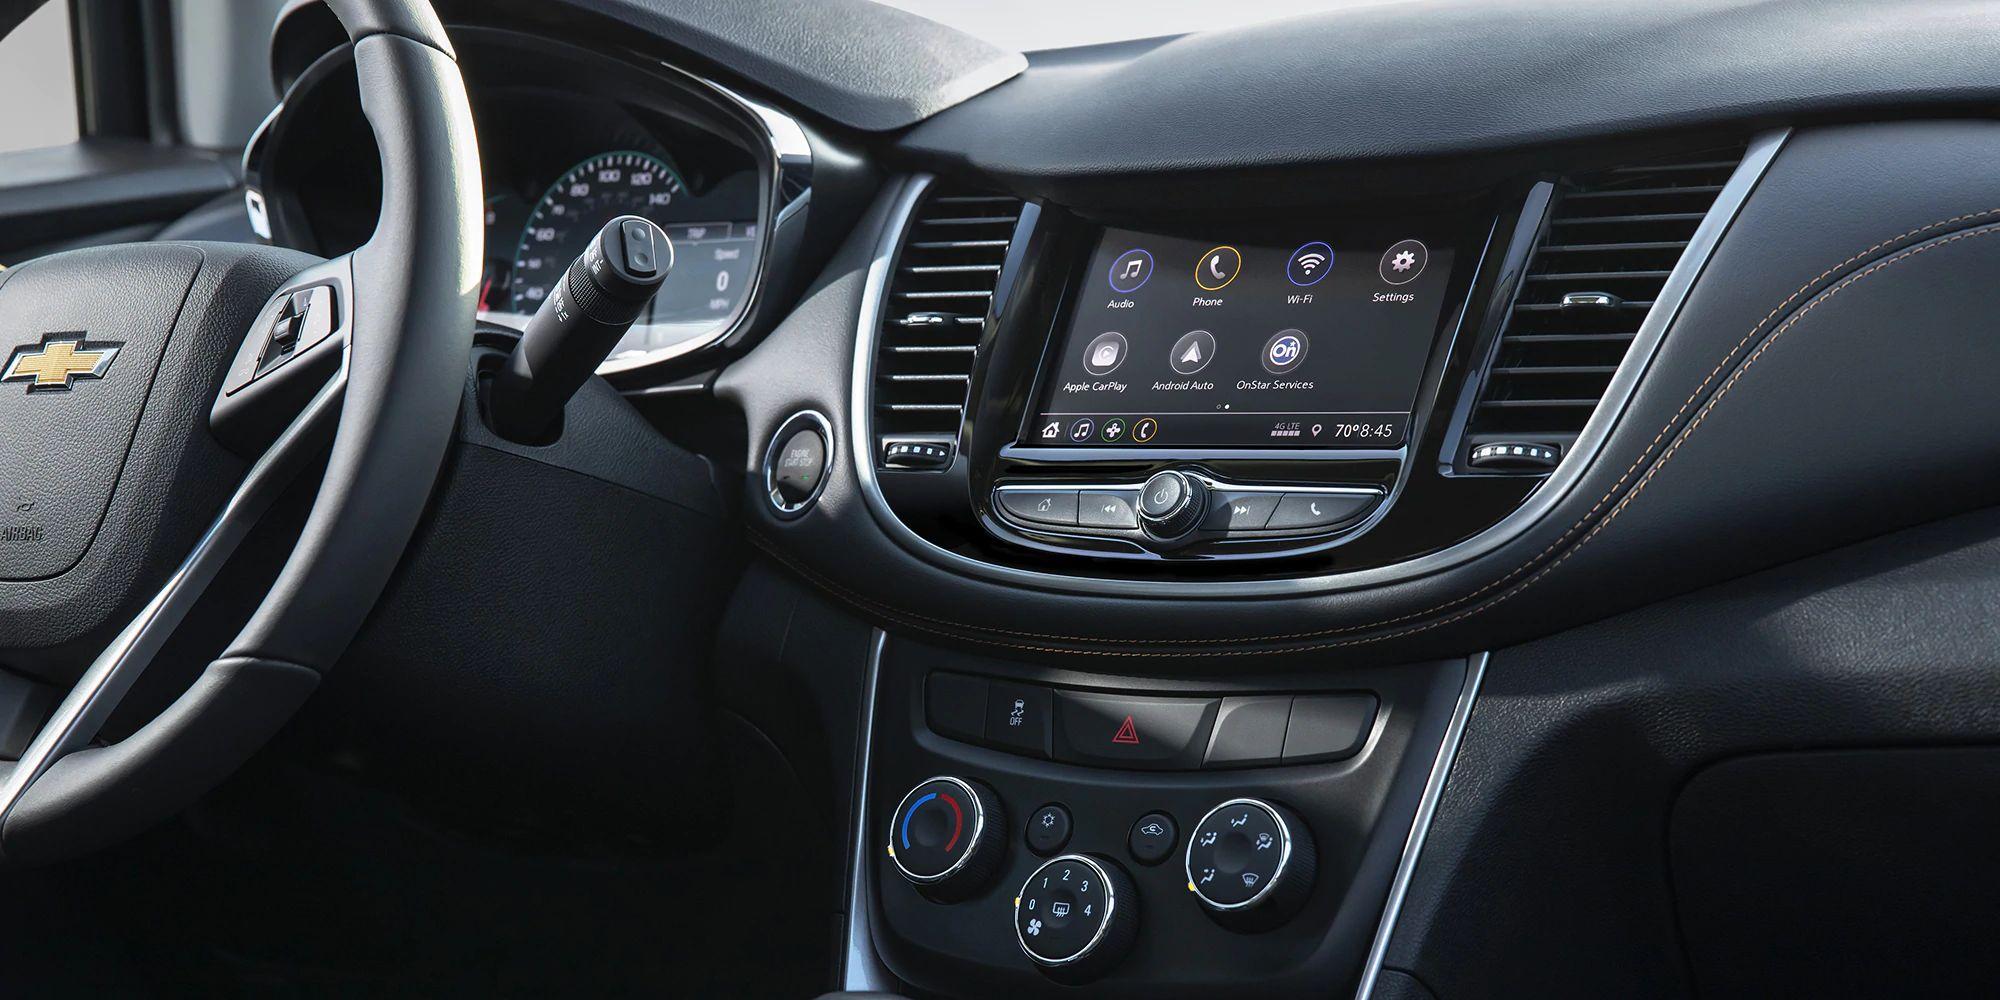 2021 Chevrolet Trax Interior